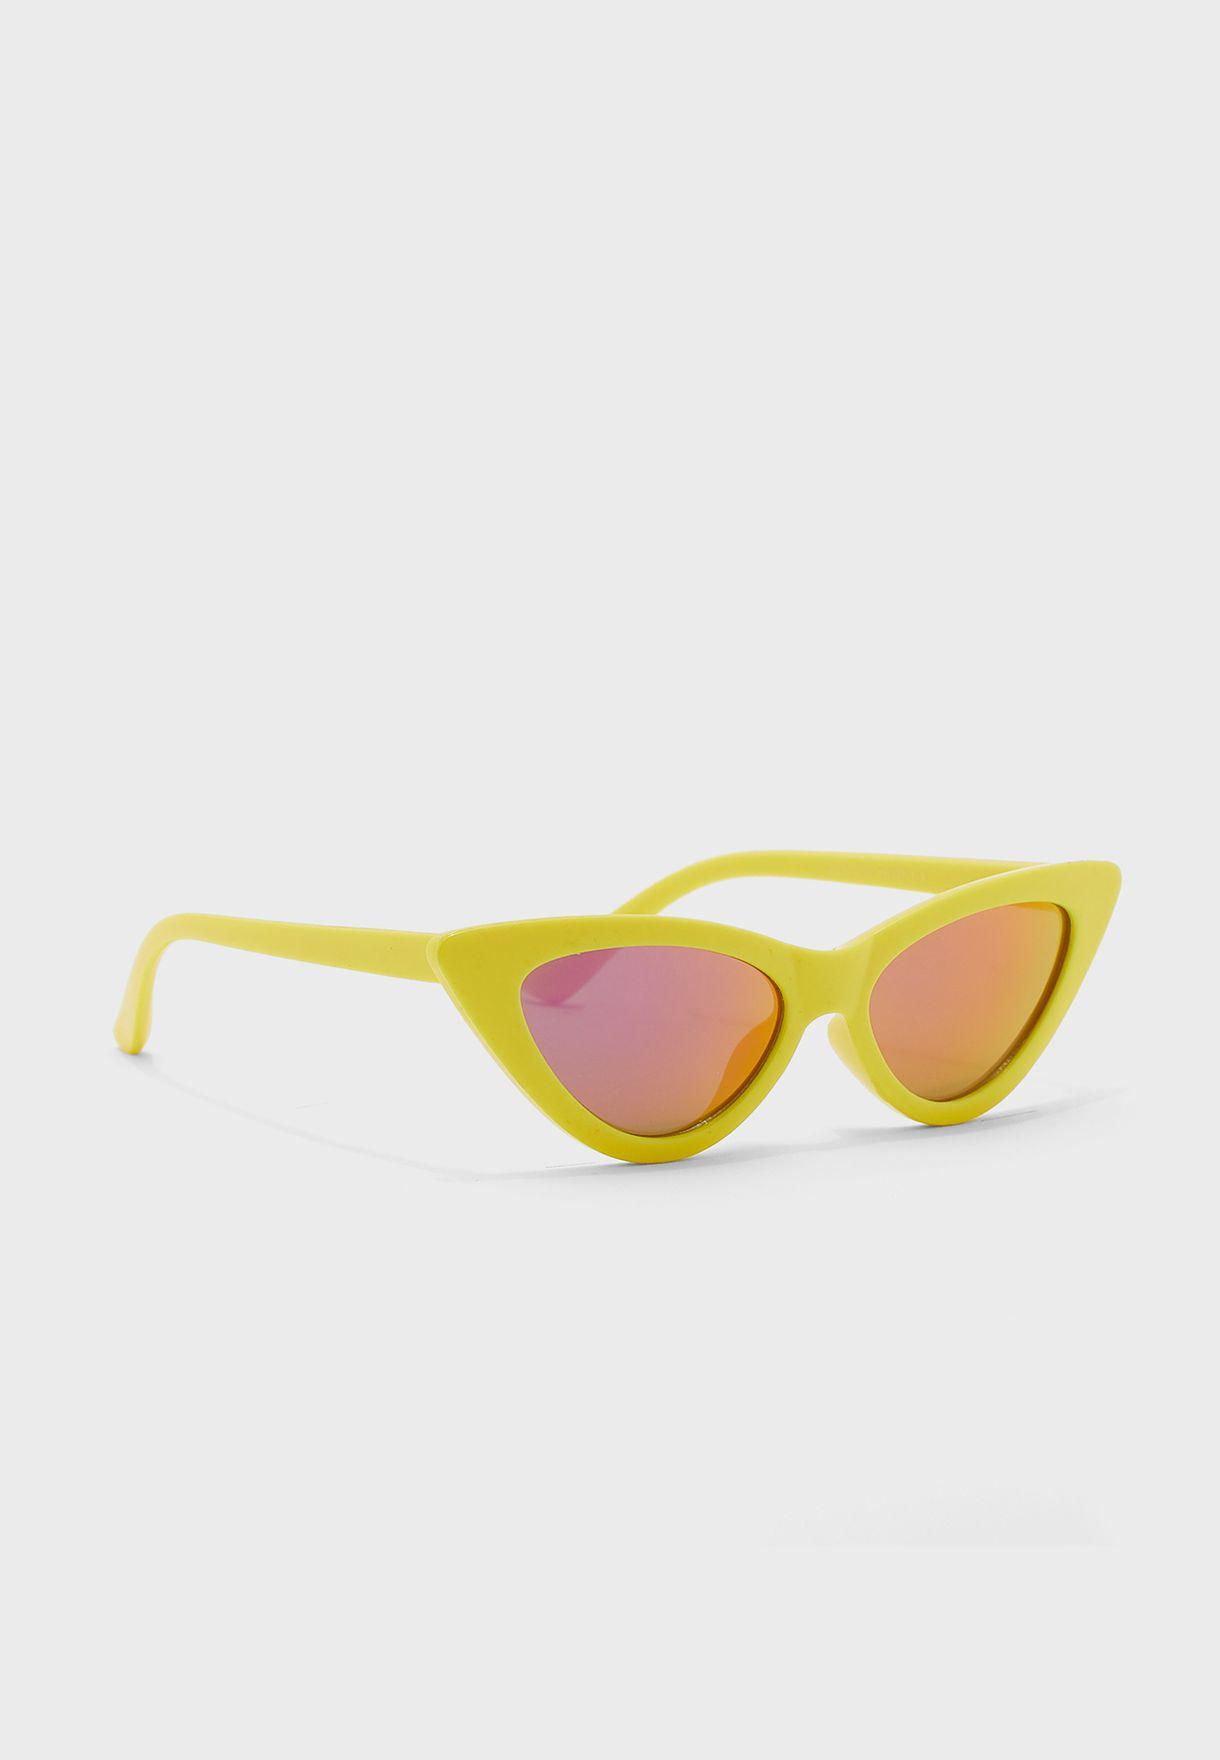 Kids Casual Sunglasses